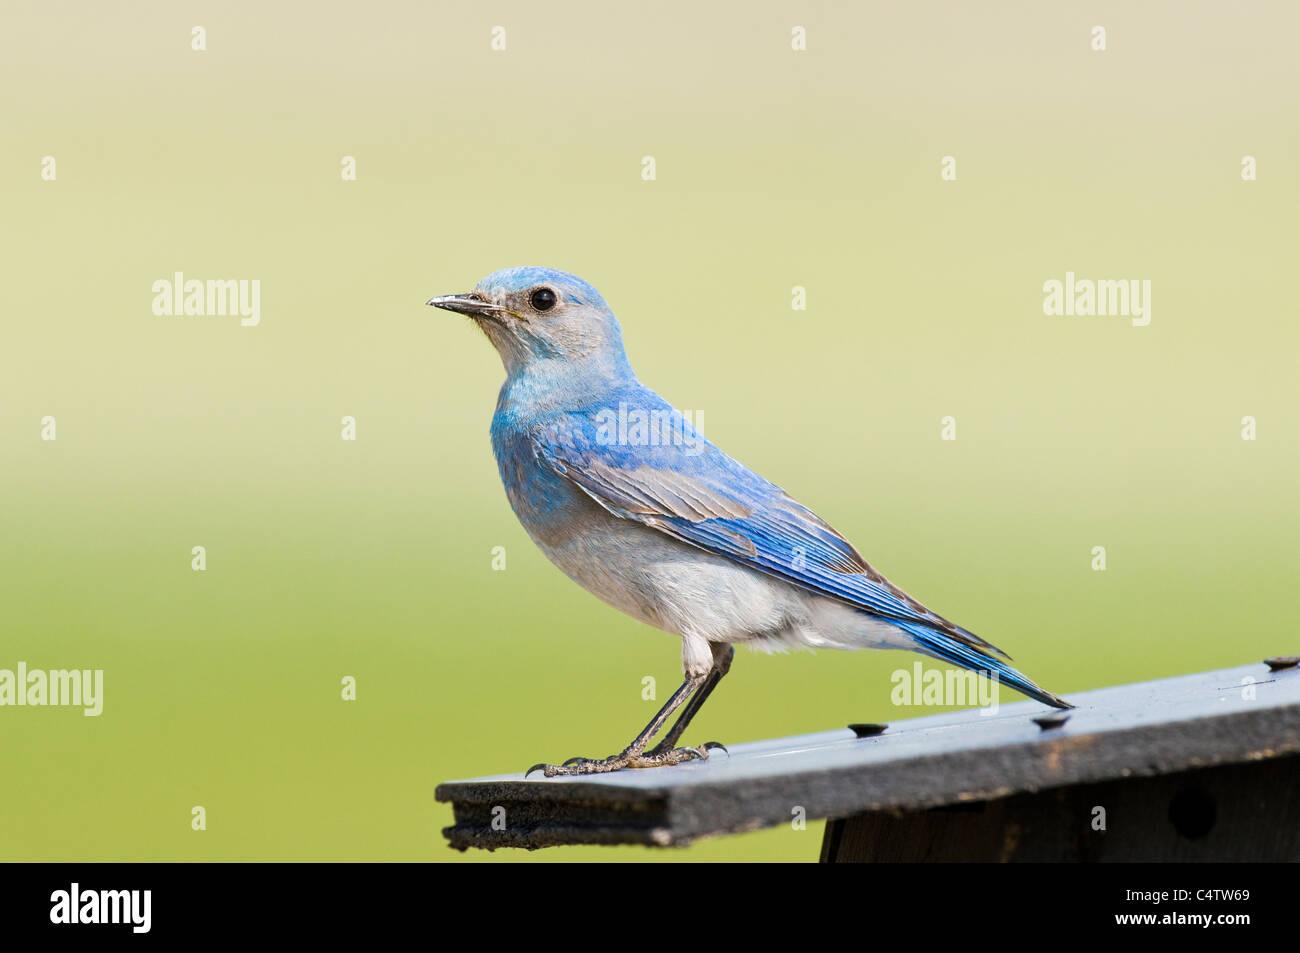 Male mountain bluebird (Sialia currucoides) on top of birdhouse - Stock Image